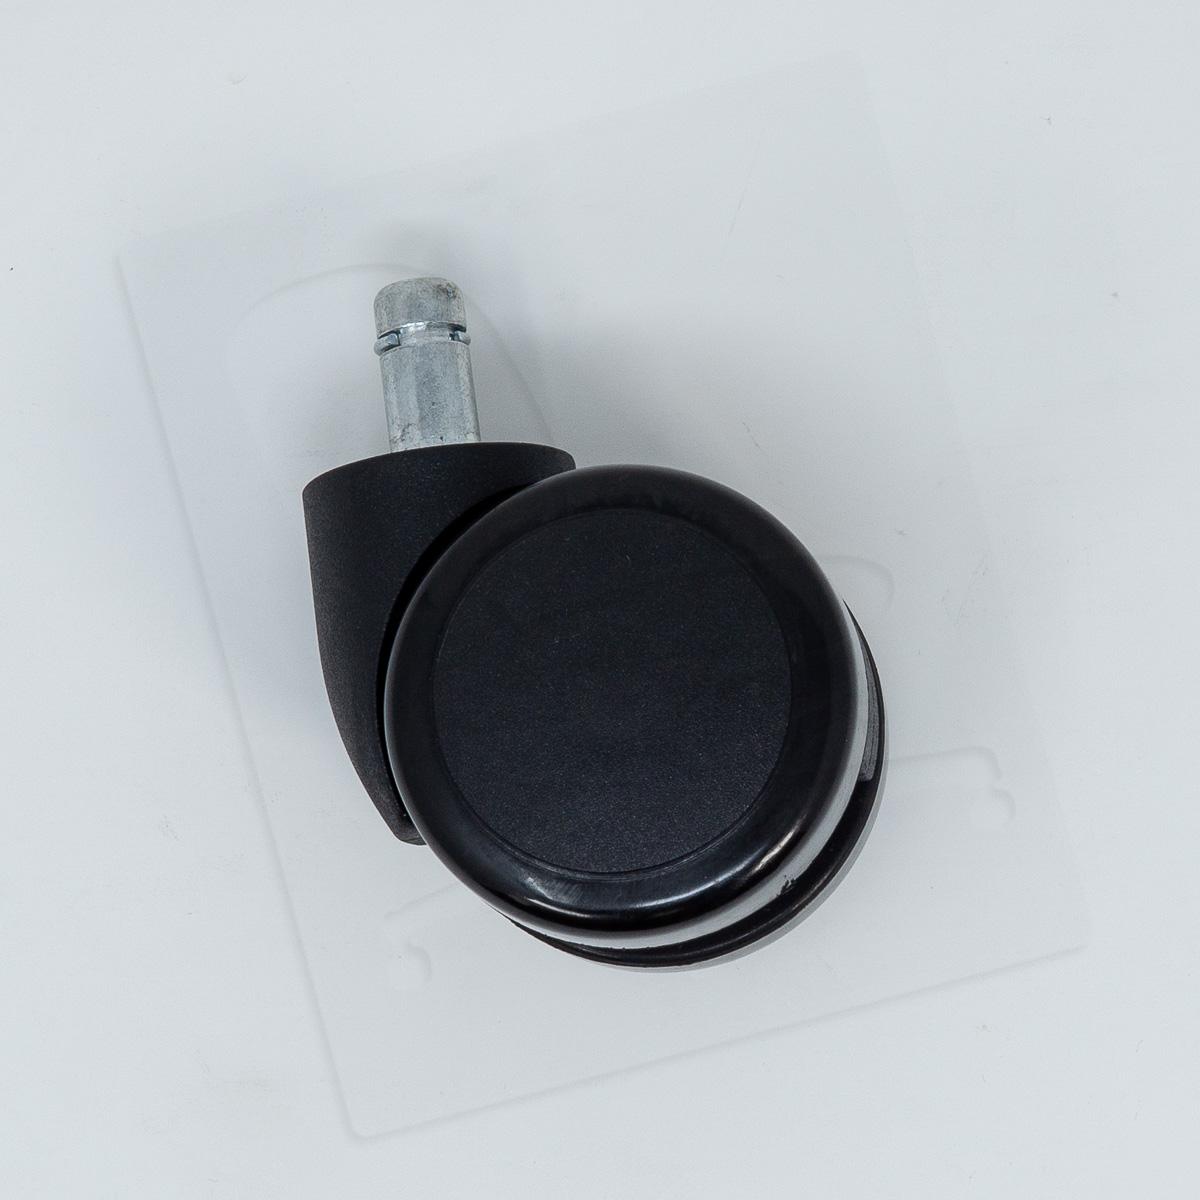 Crandall Office Furniture Aftermarket Steelcase 458 Sensor Hard Floor Casters 0001